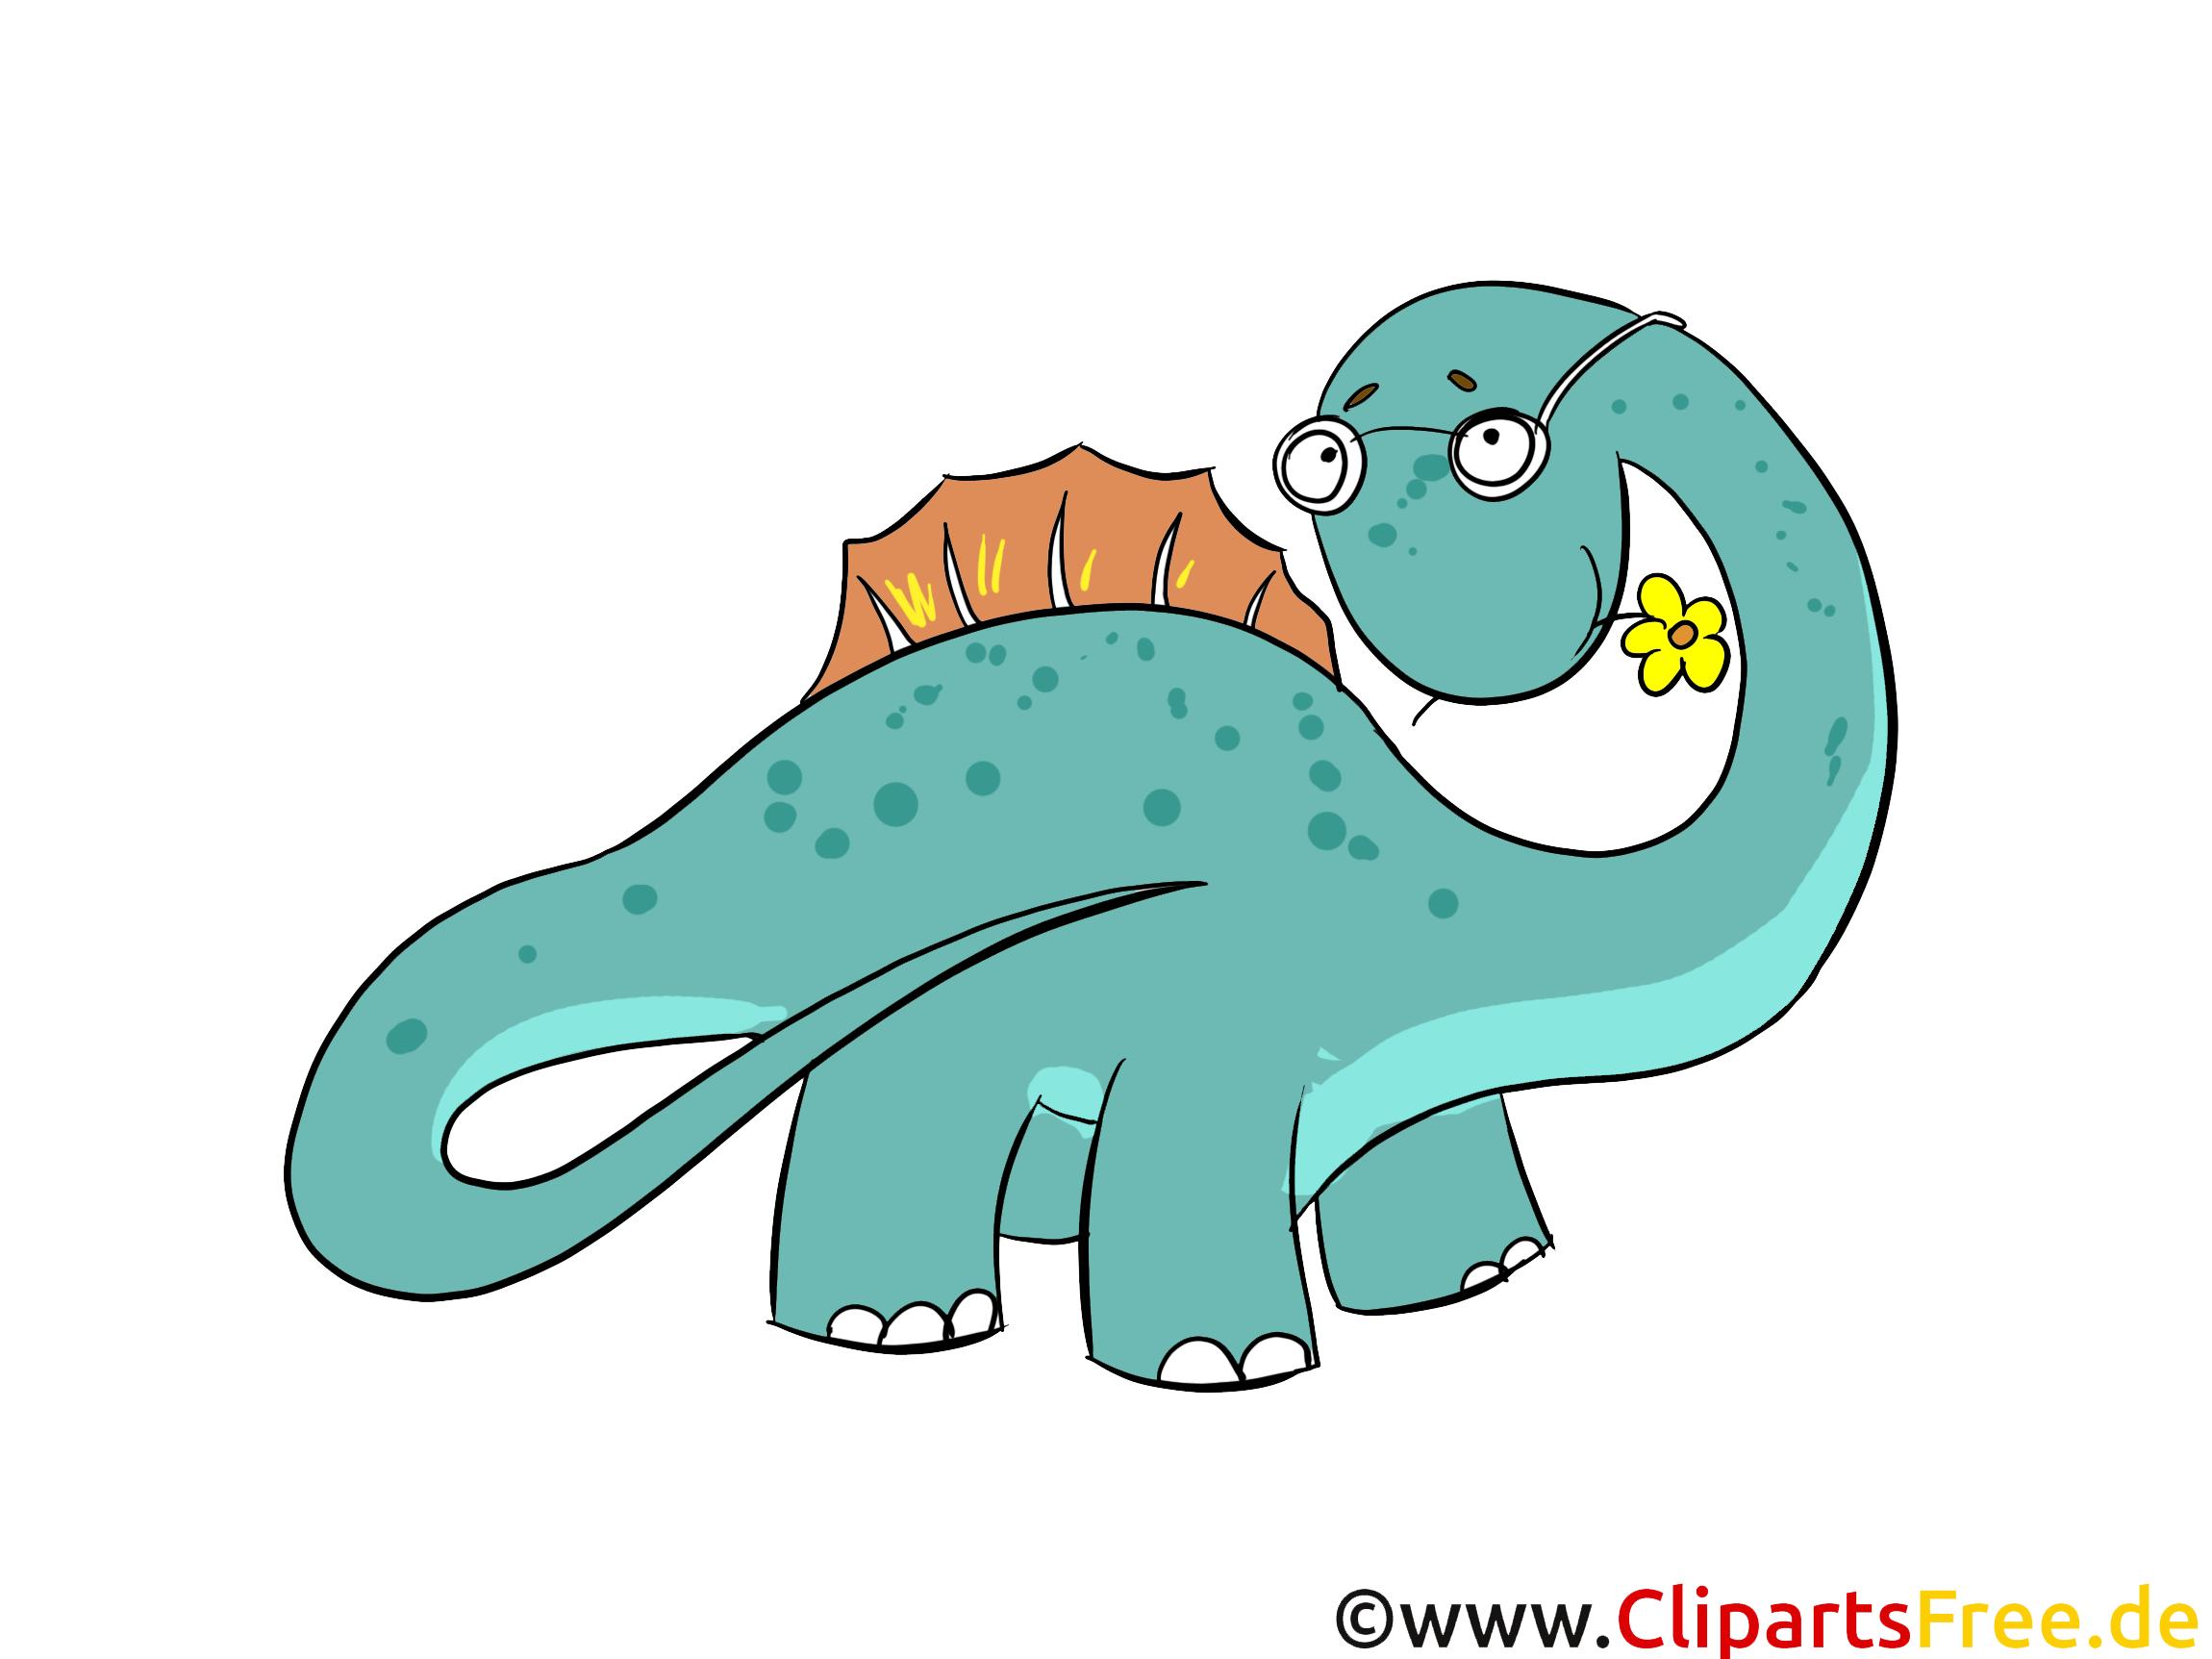 dinosaure clipart gratuit images dinosaure dessin picture image rh fr clipproject info clipart gratuit anniversaire clipart gratuit mariage